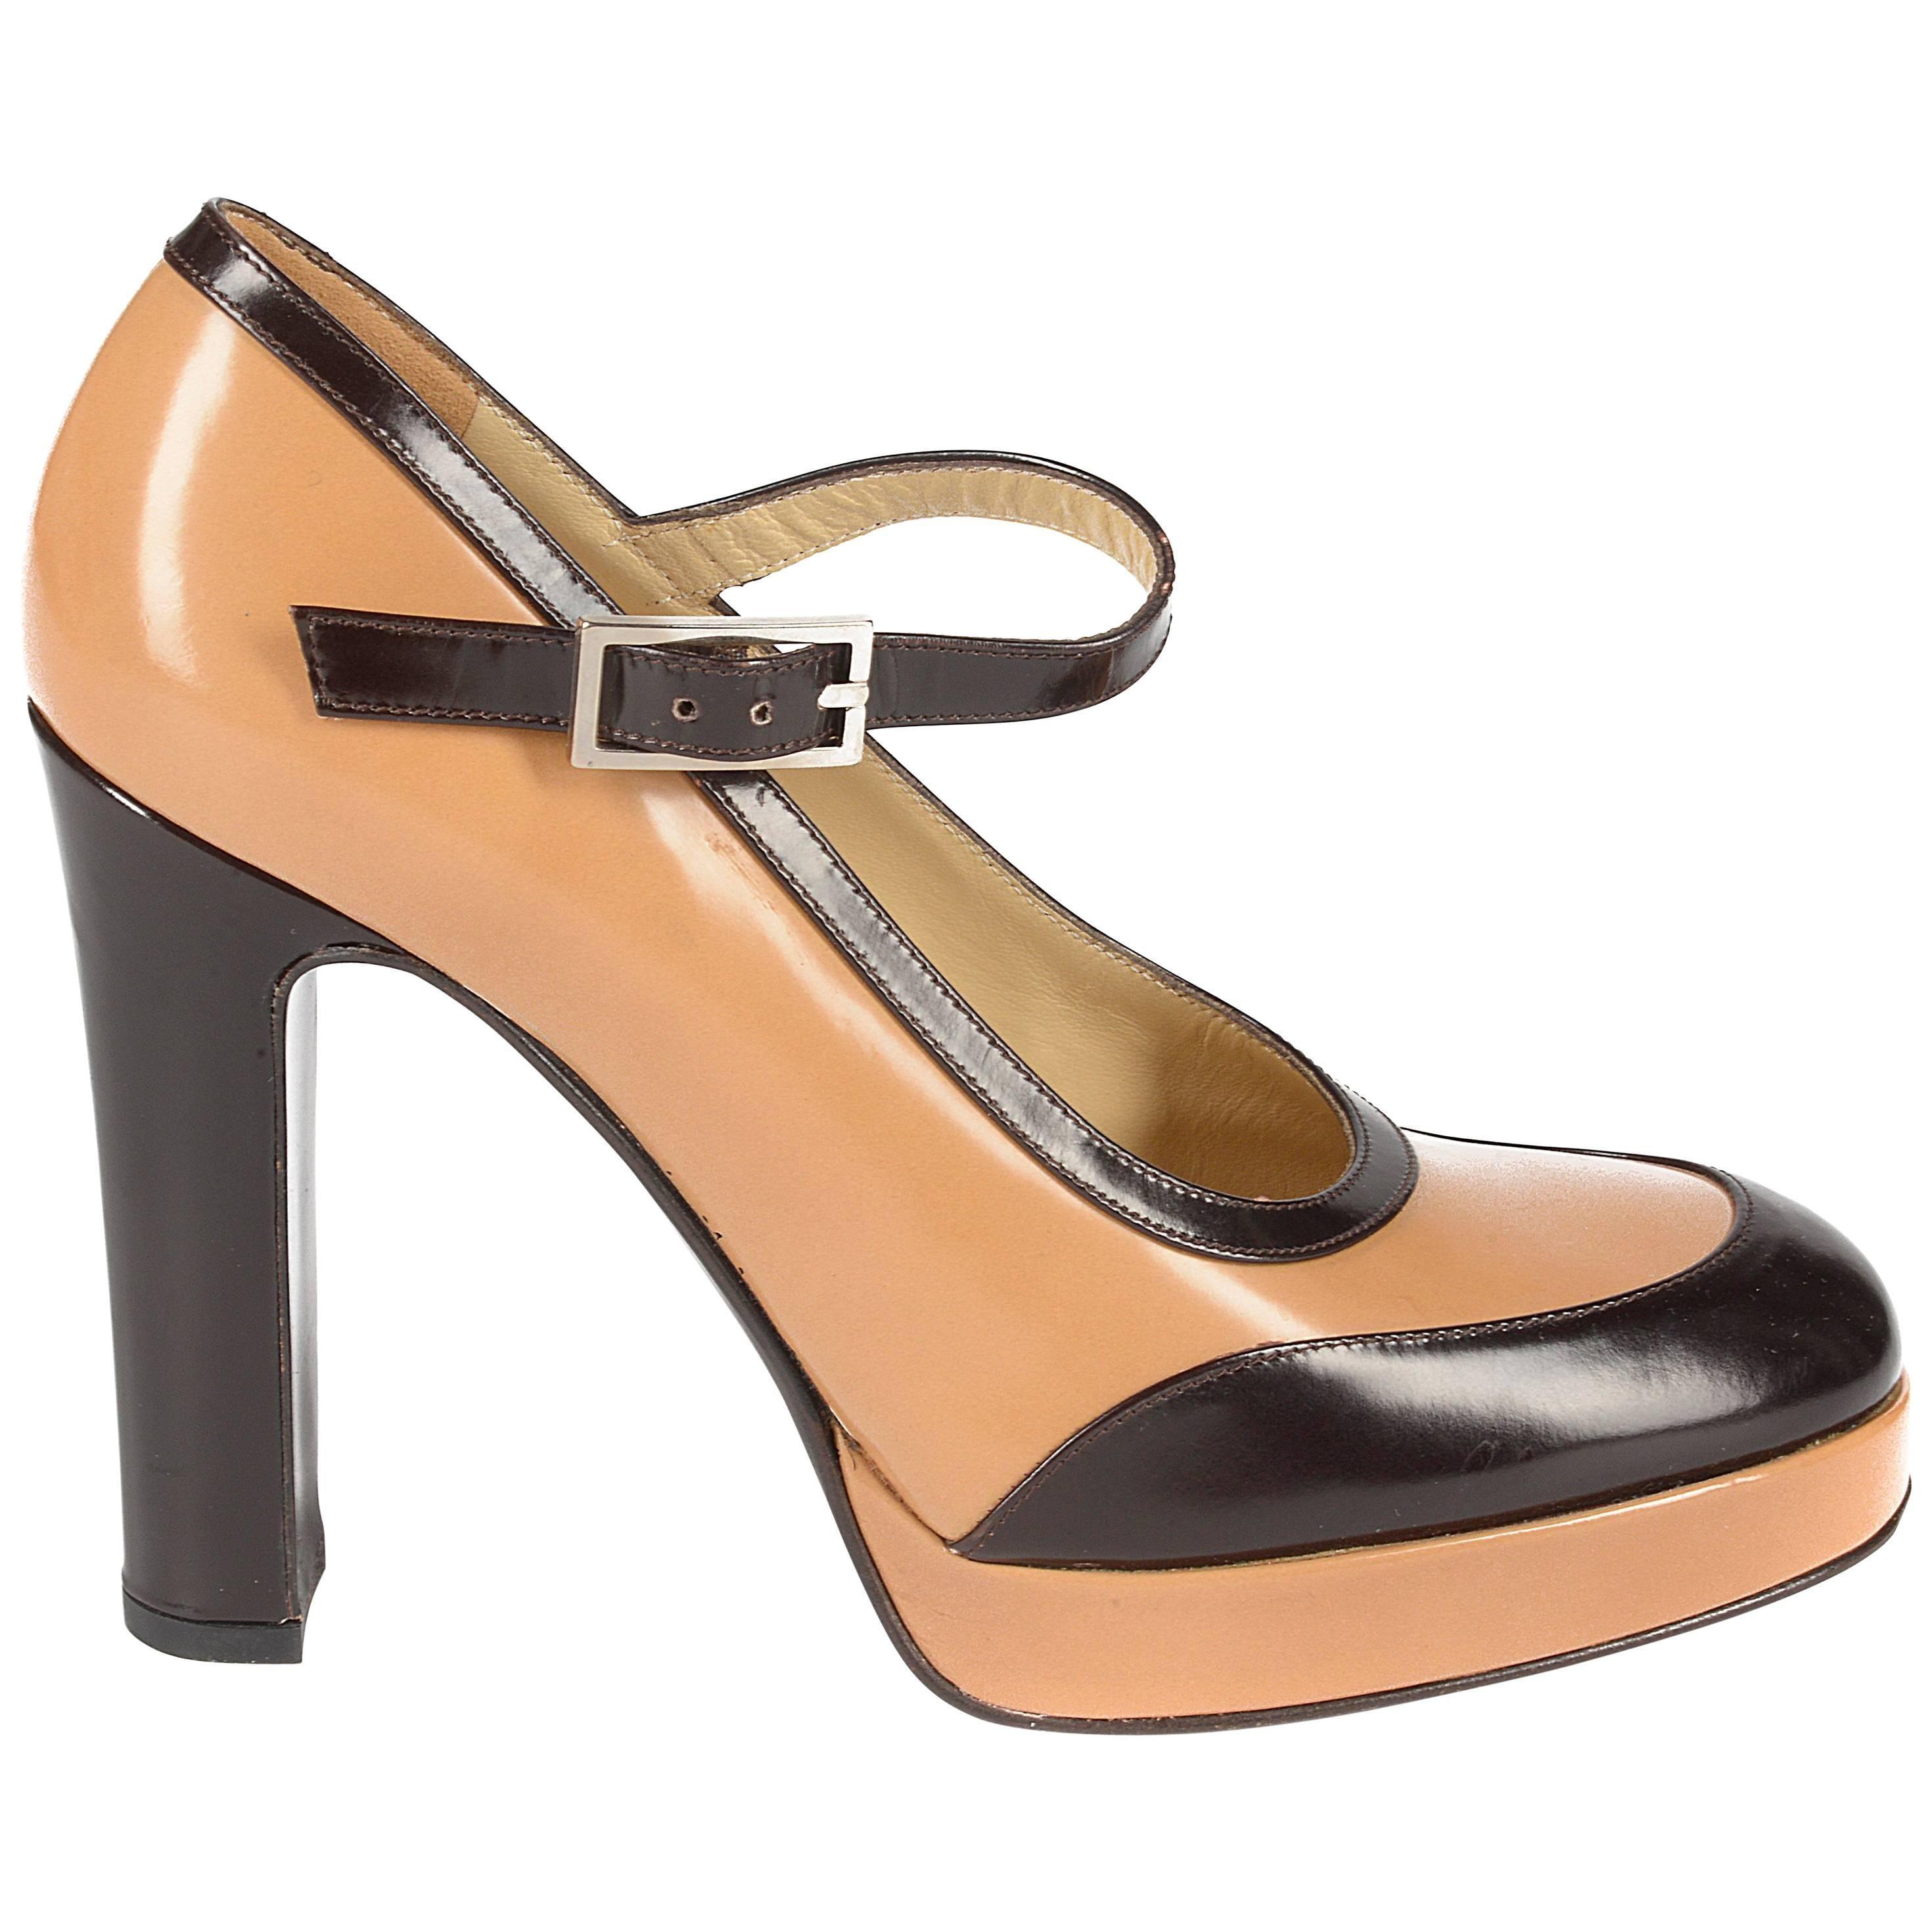 Dolce & Gabbana tan and brown leather platform sandals, sz 39